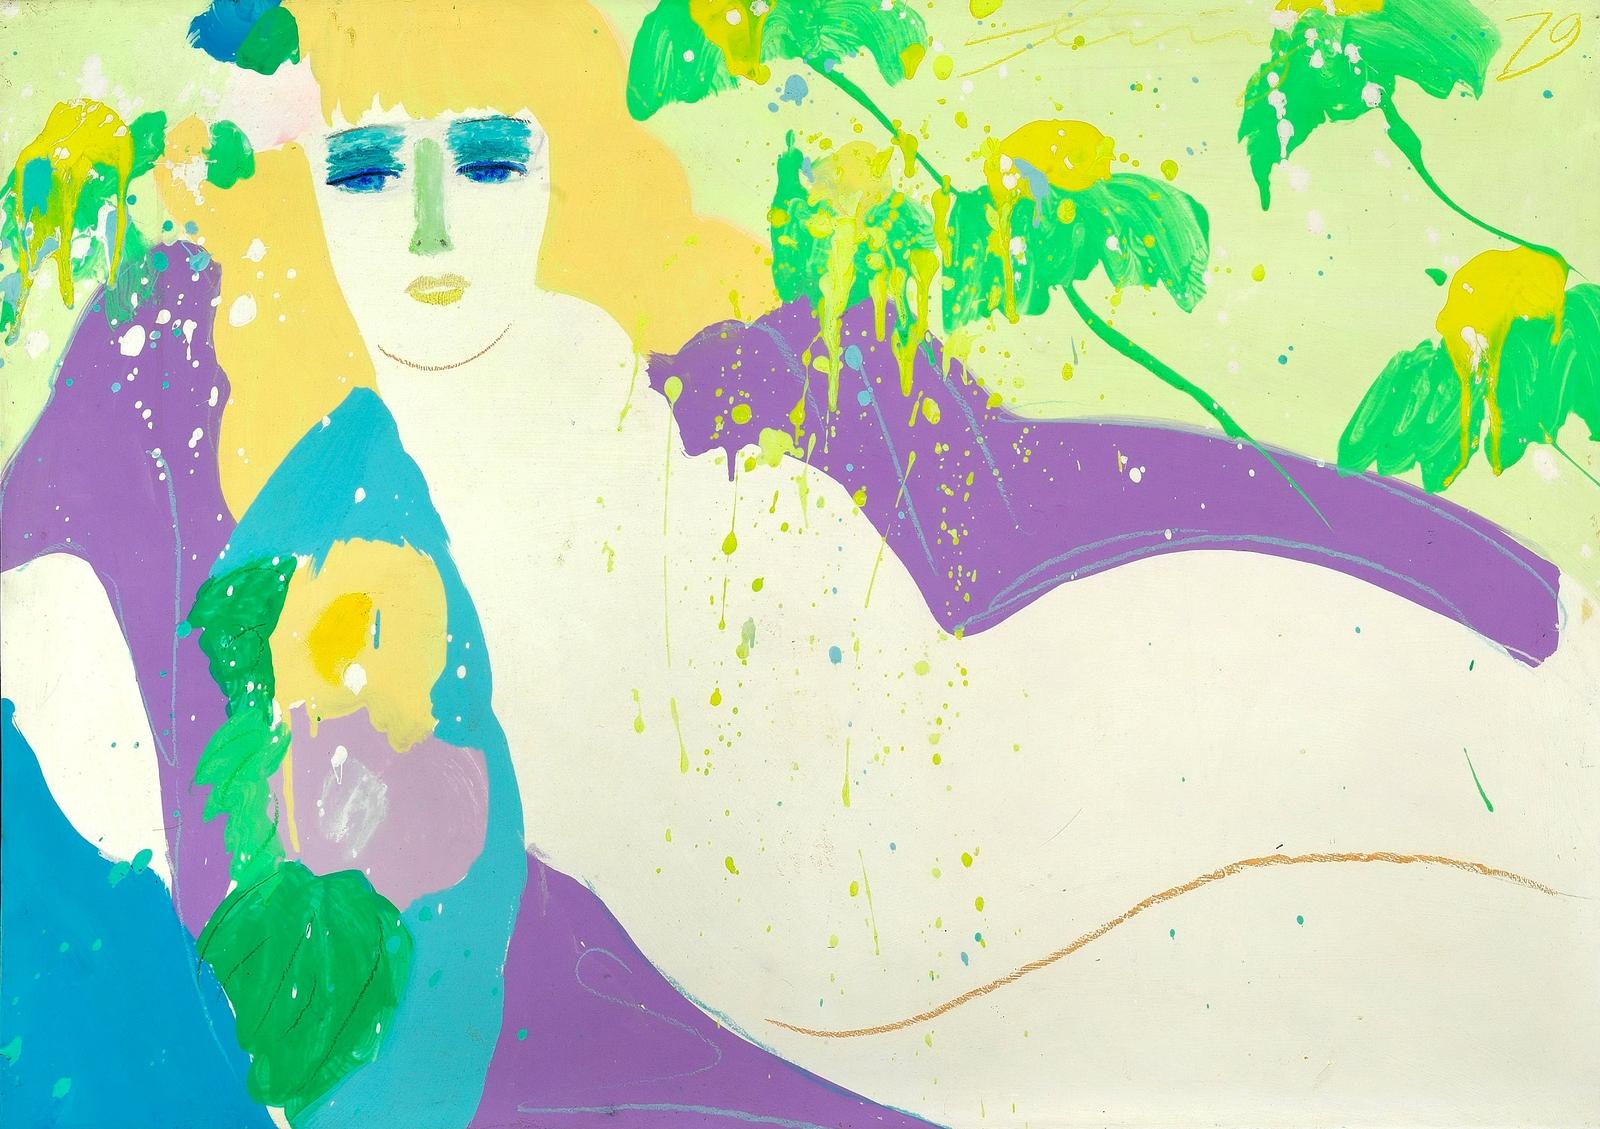 1979_Женщина и цветы (Woman and flowers)_71 х 100_бумага на холсте, акрил_Частное собрание.jpg